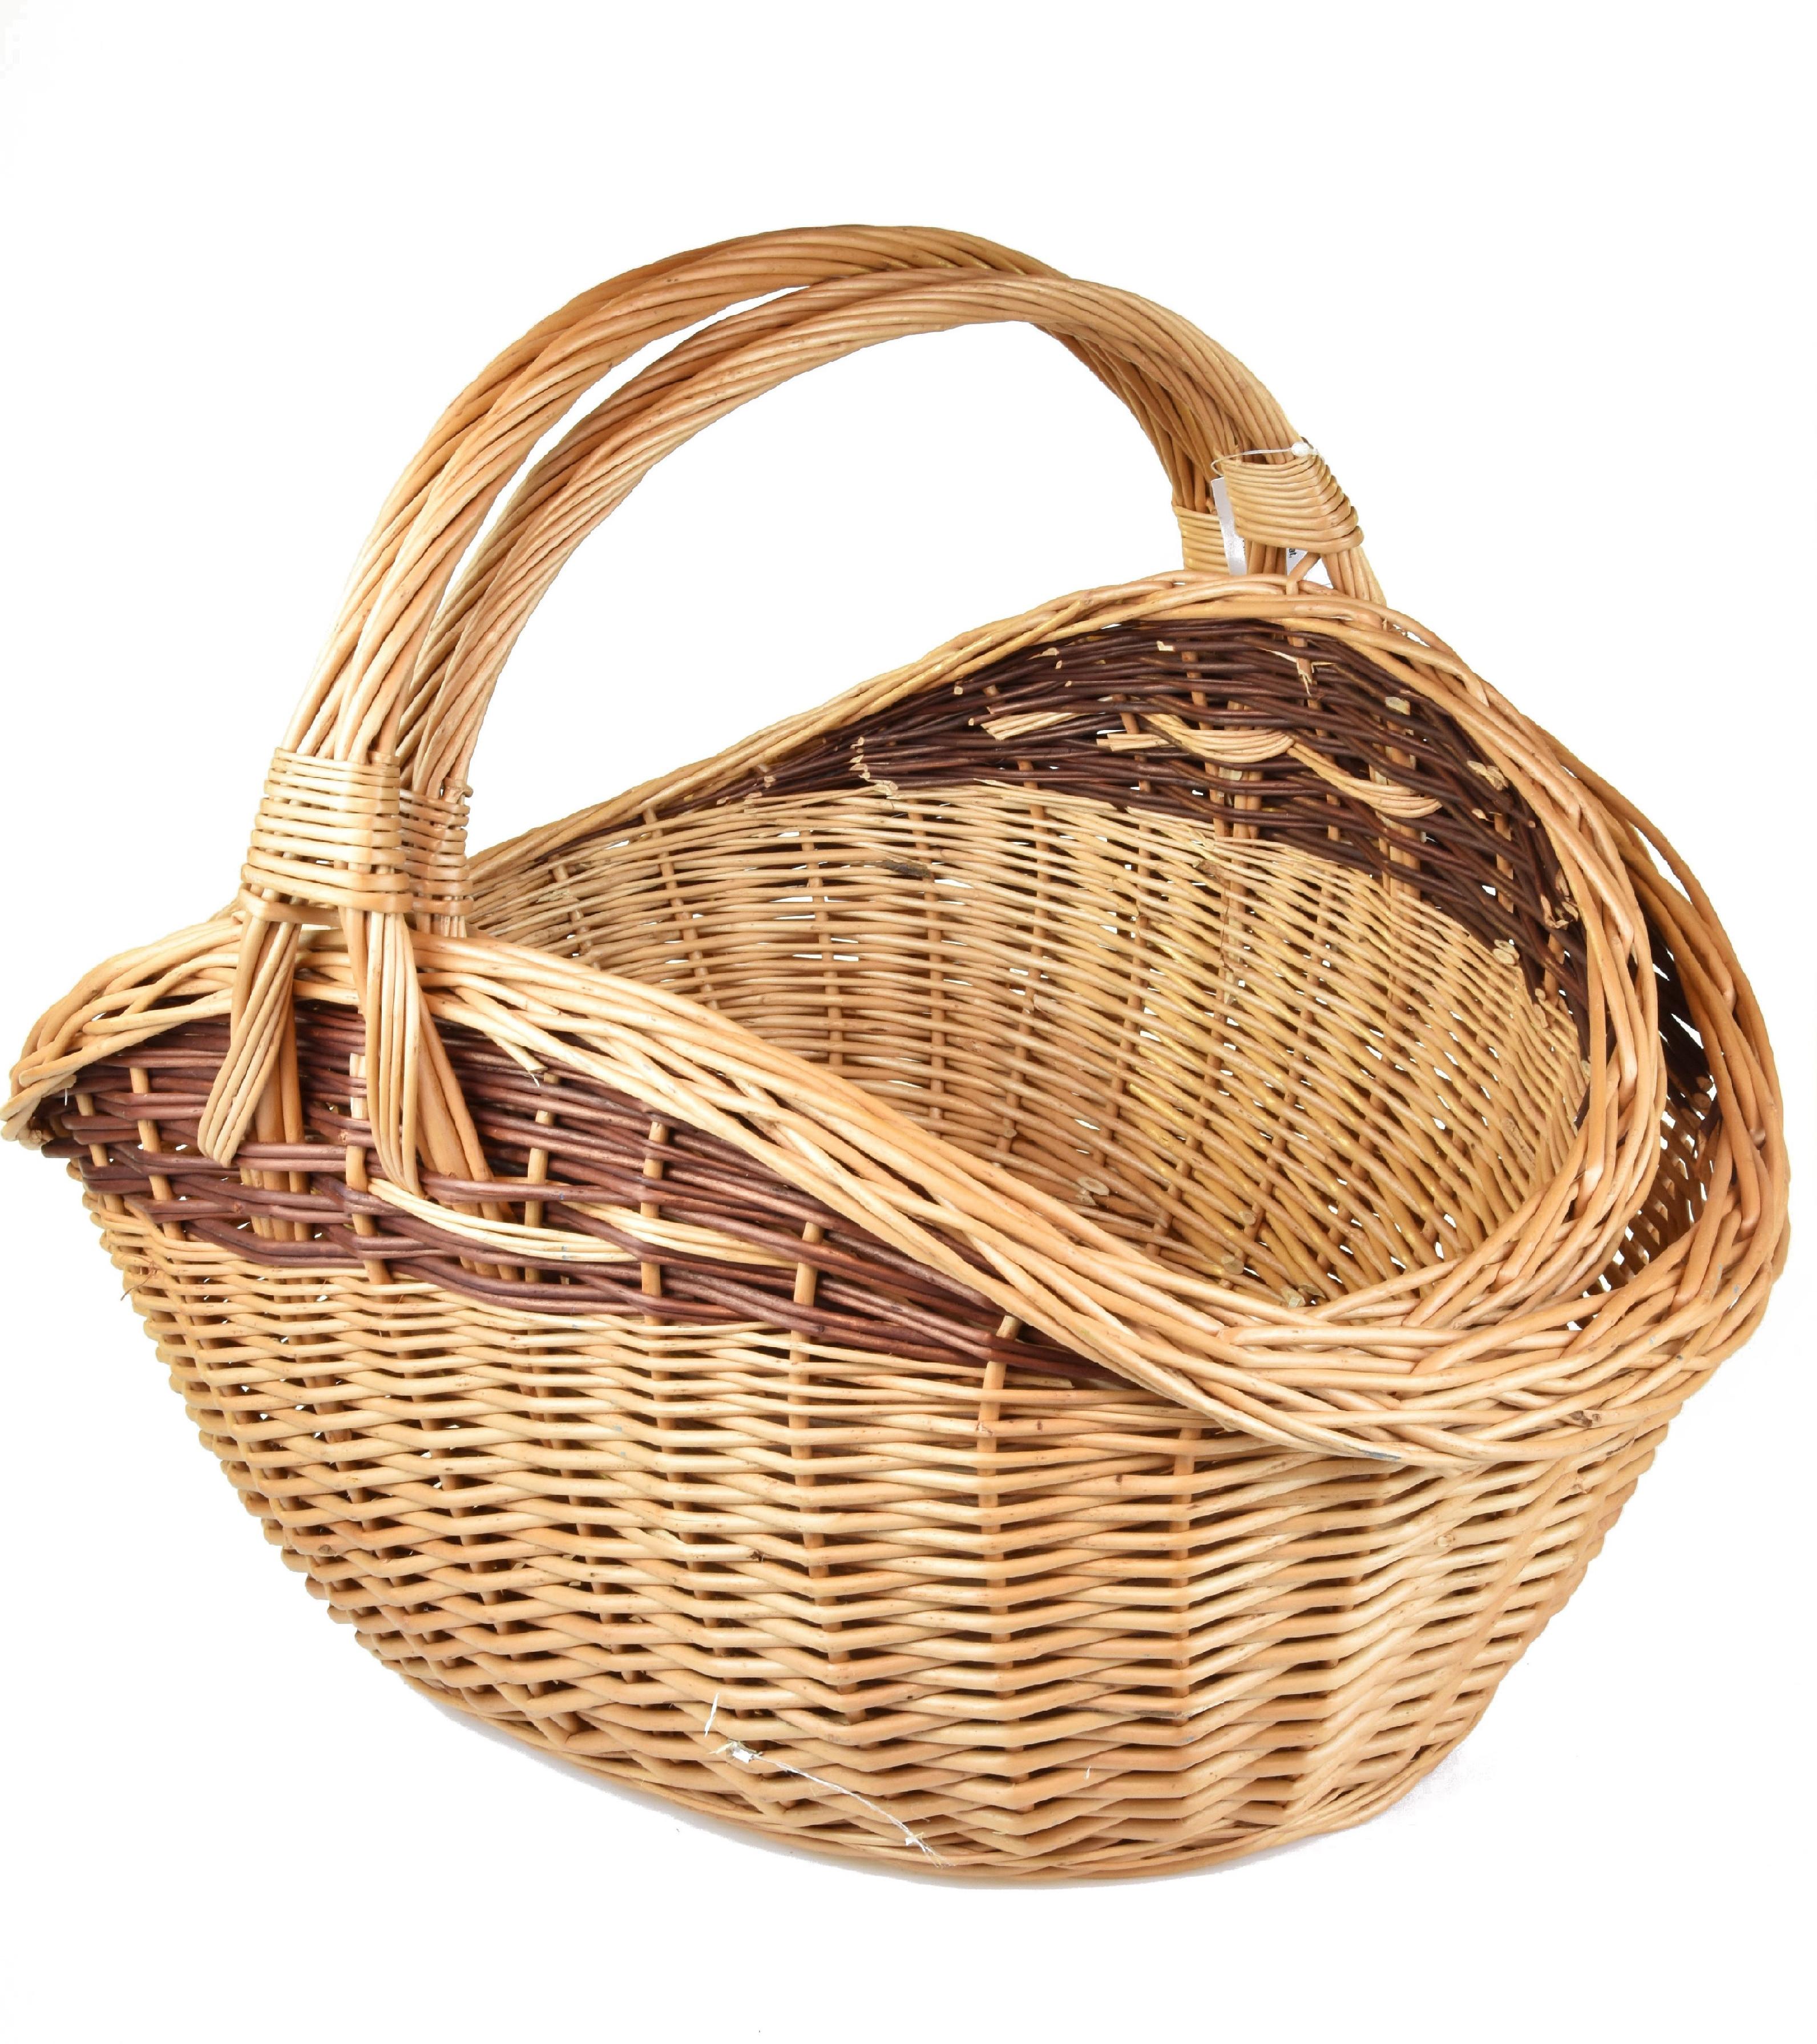 Koš na dřevo tvaru vejce Rozměry (cm): 59X46, v. 46 cm